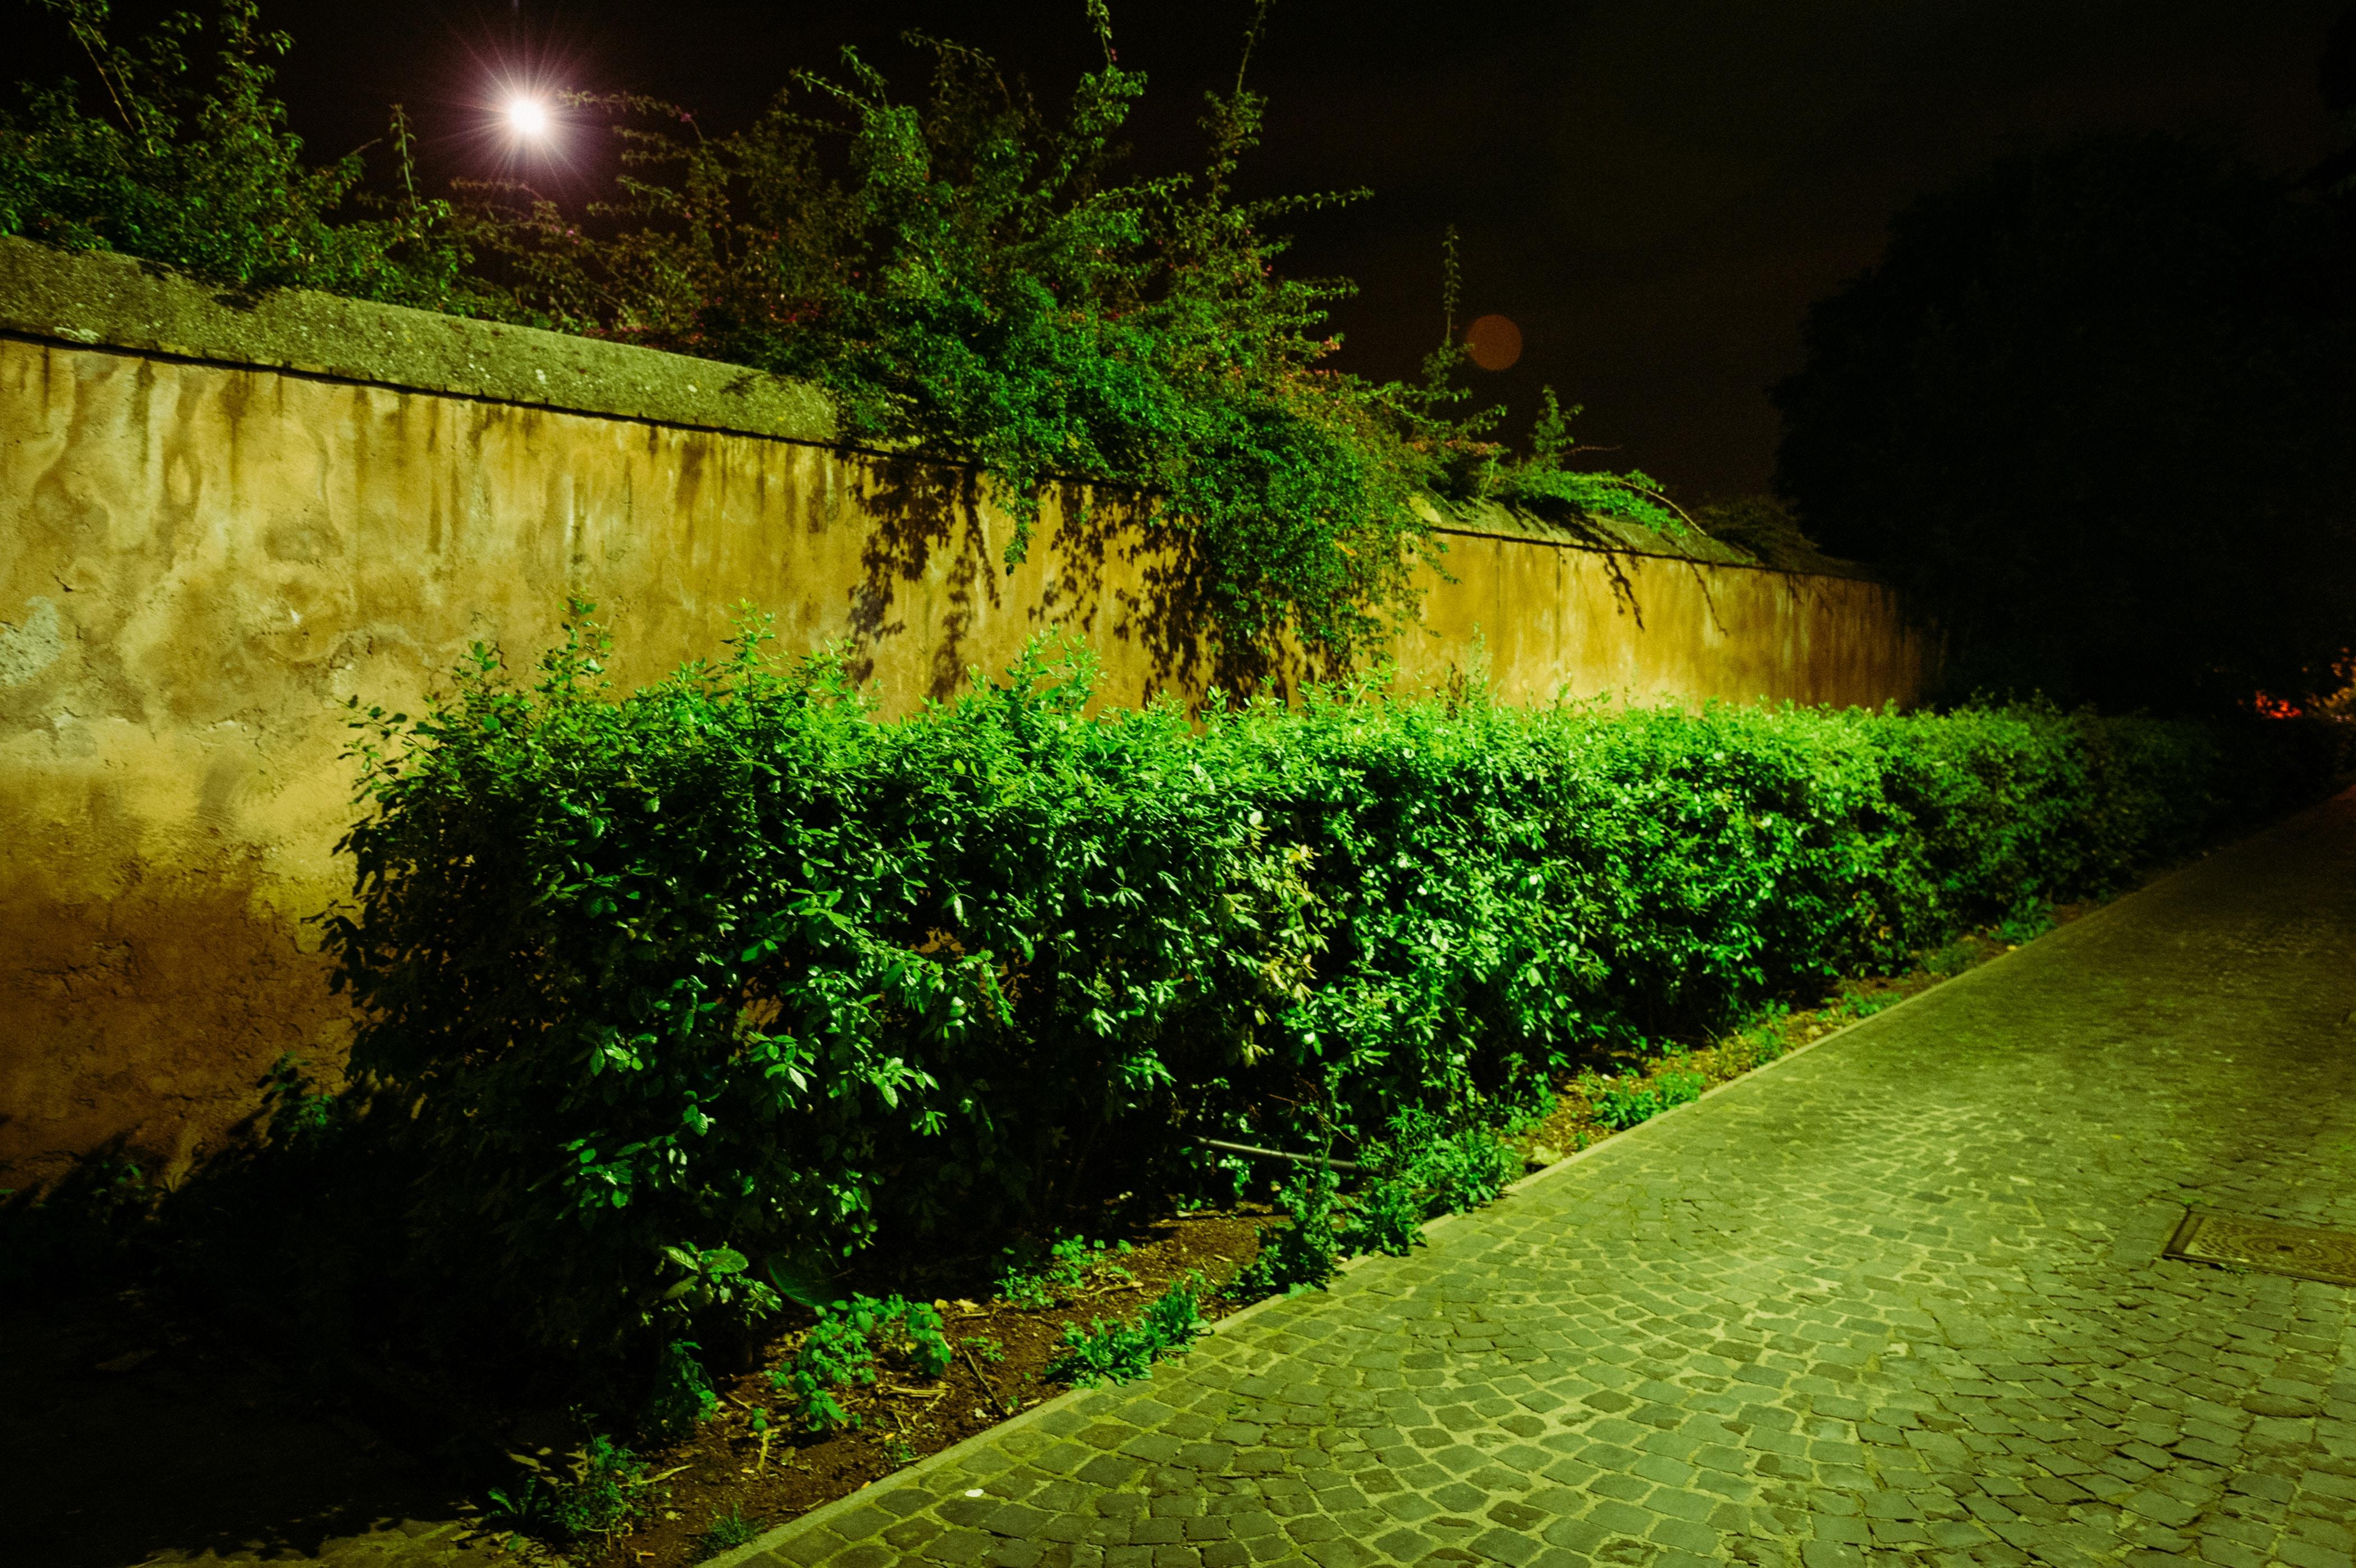 Free Unsplash photo from Ludwig Thalheimer